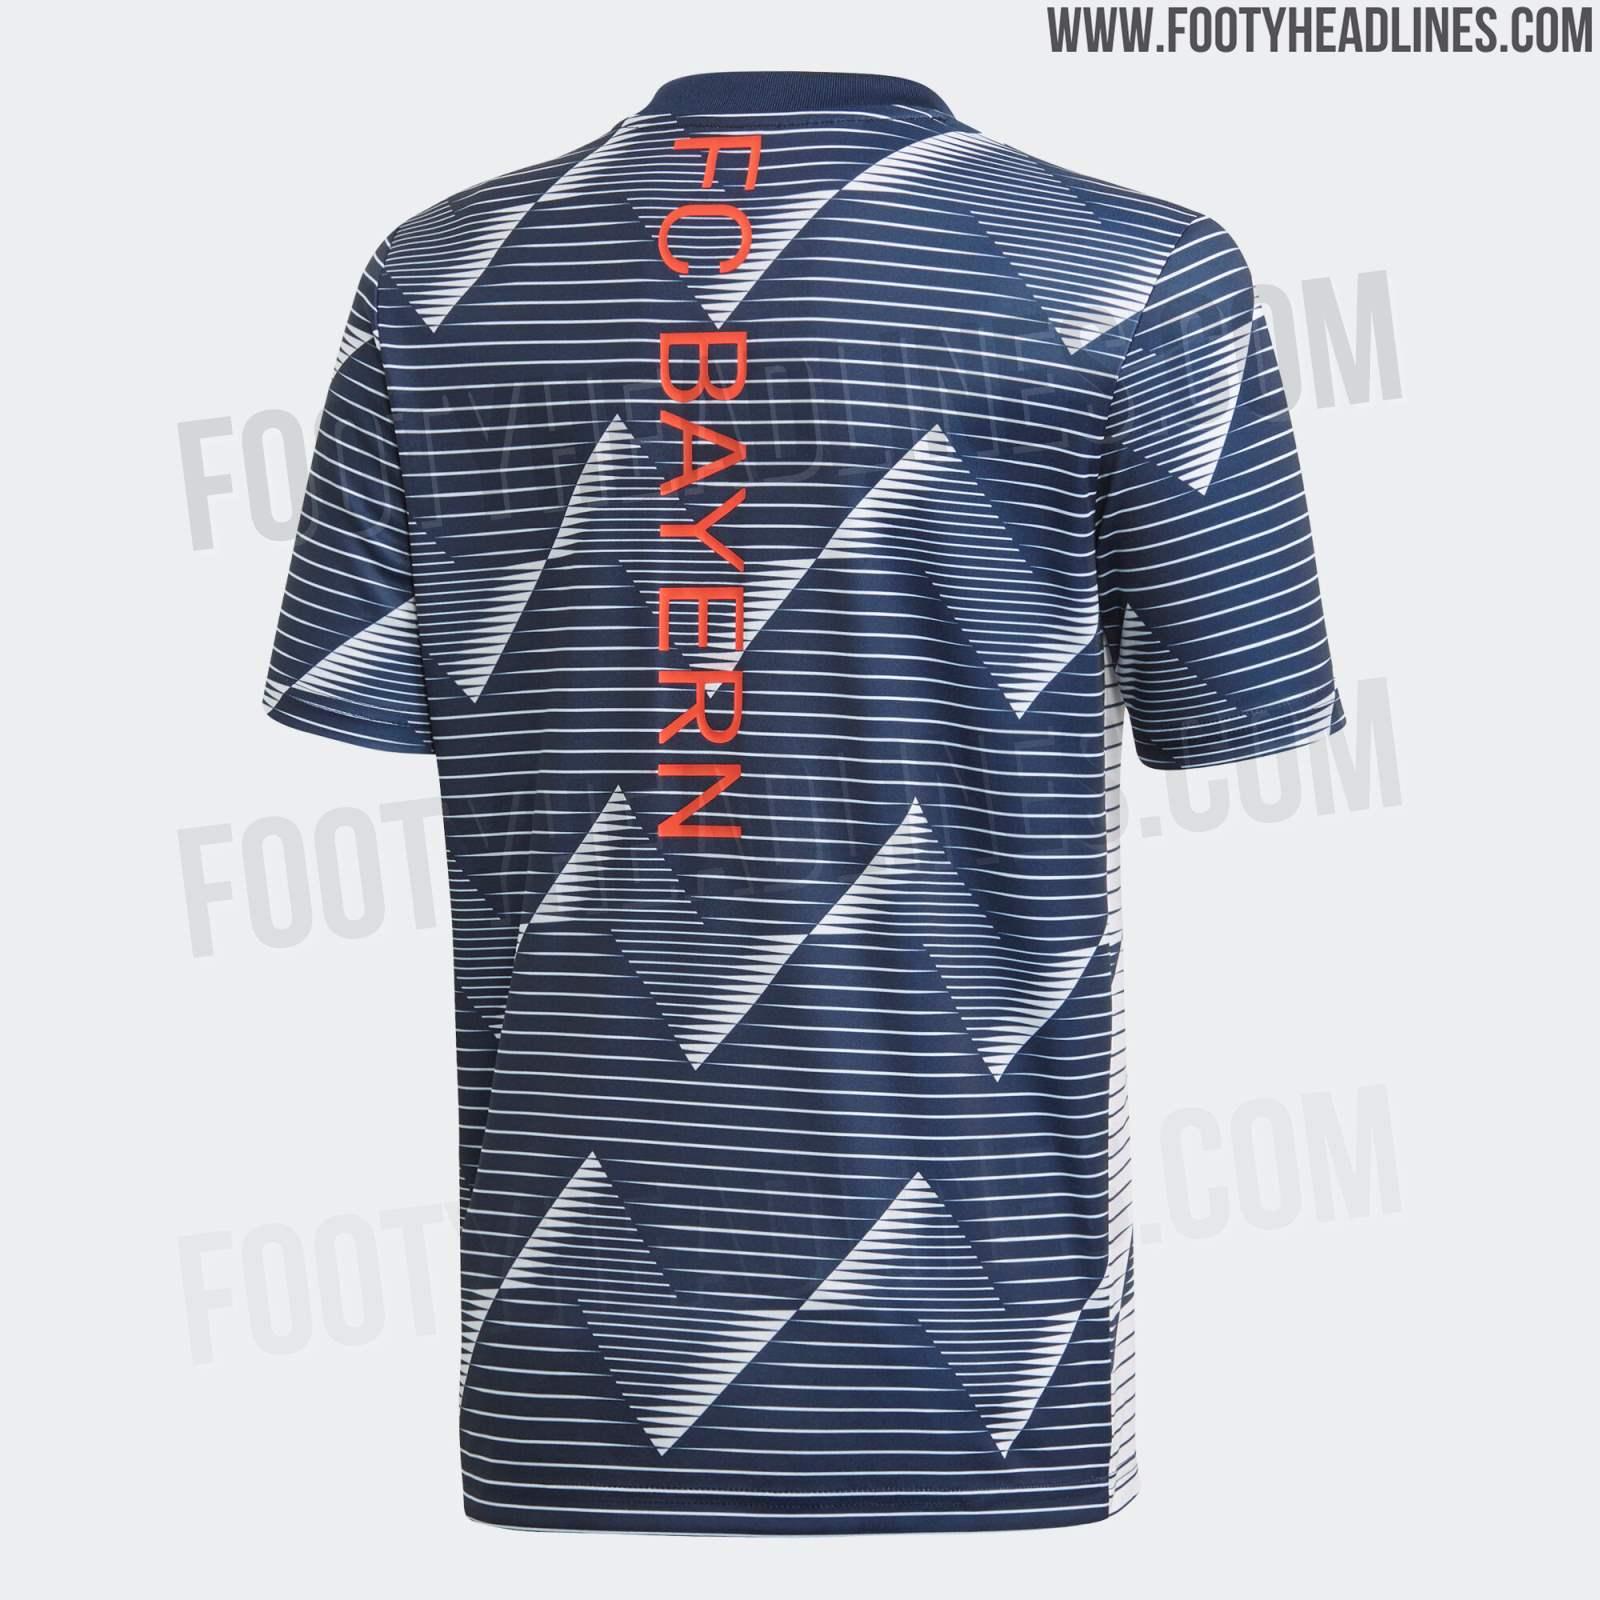 pretty nice 93d91 2144b Outstanding Bayern Munich 2020 Pre-Match Jersey Leaked ...